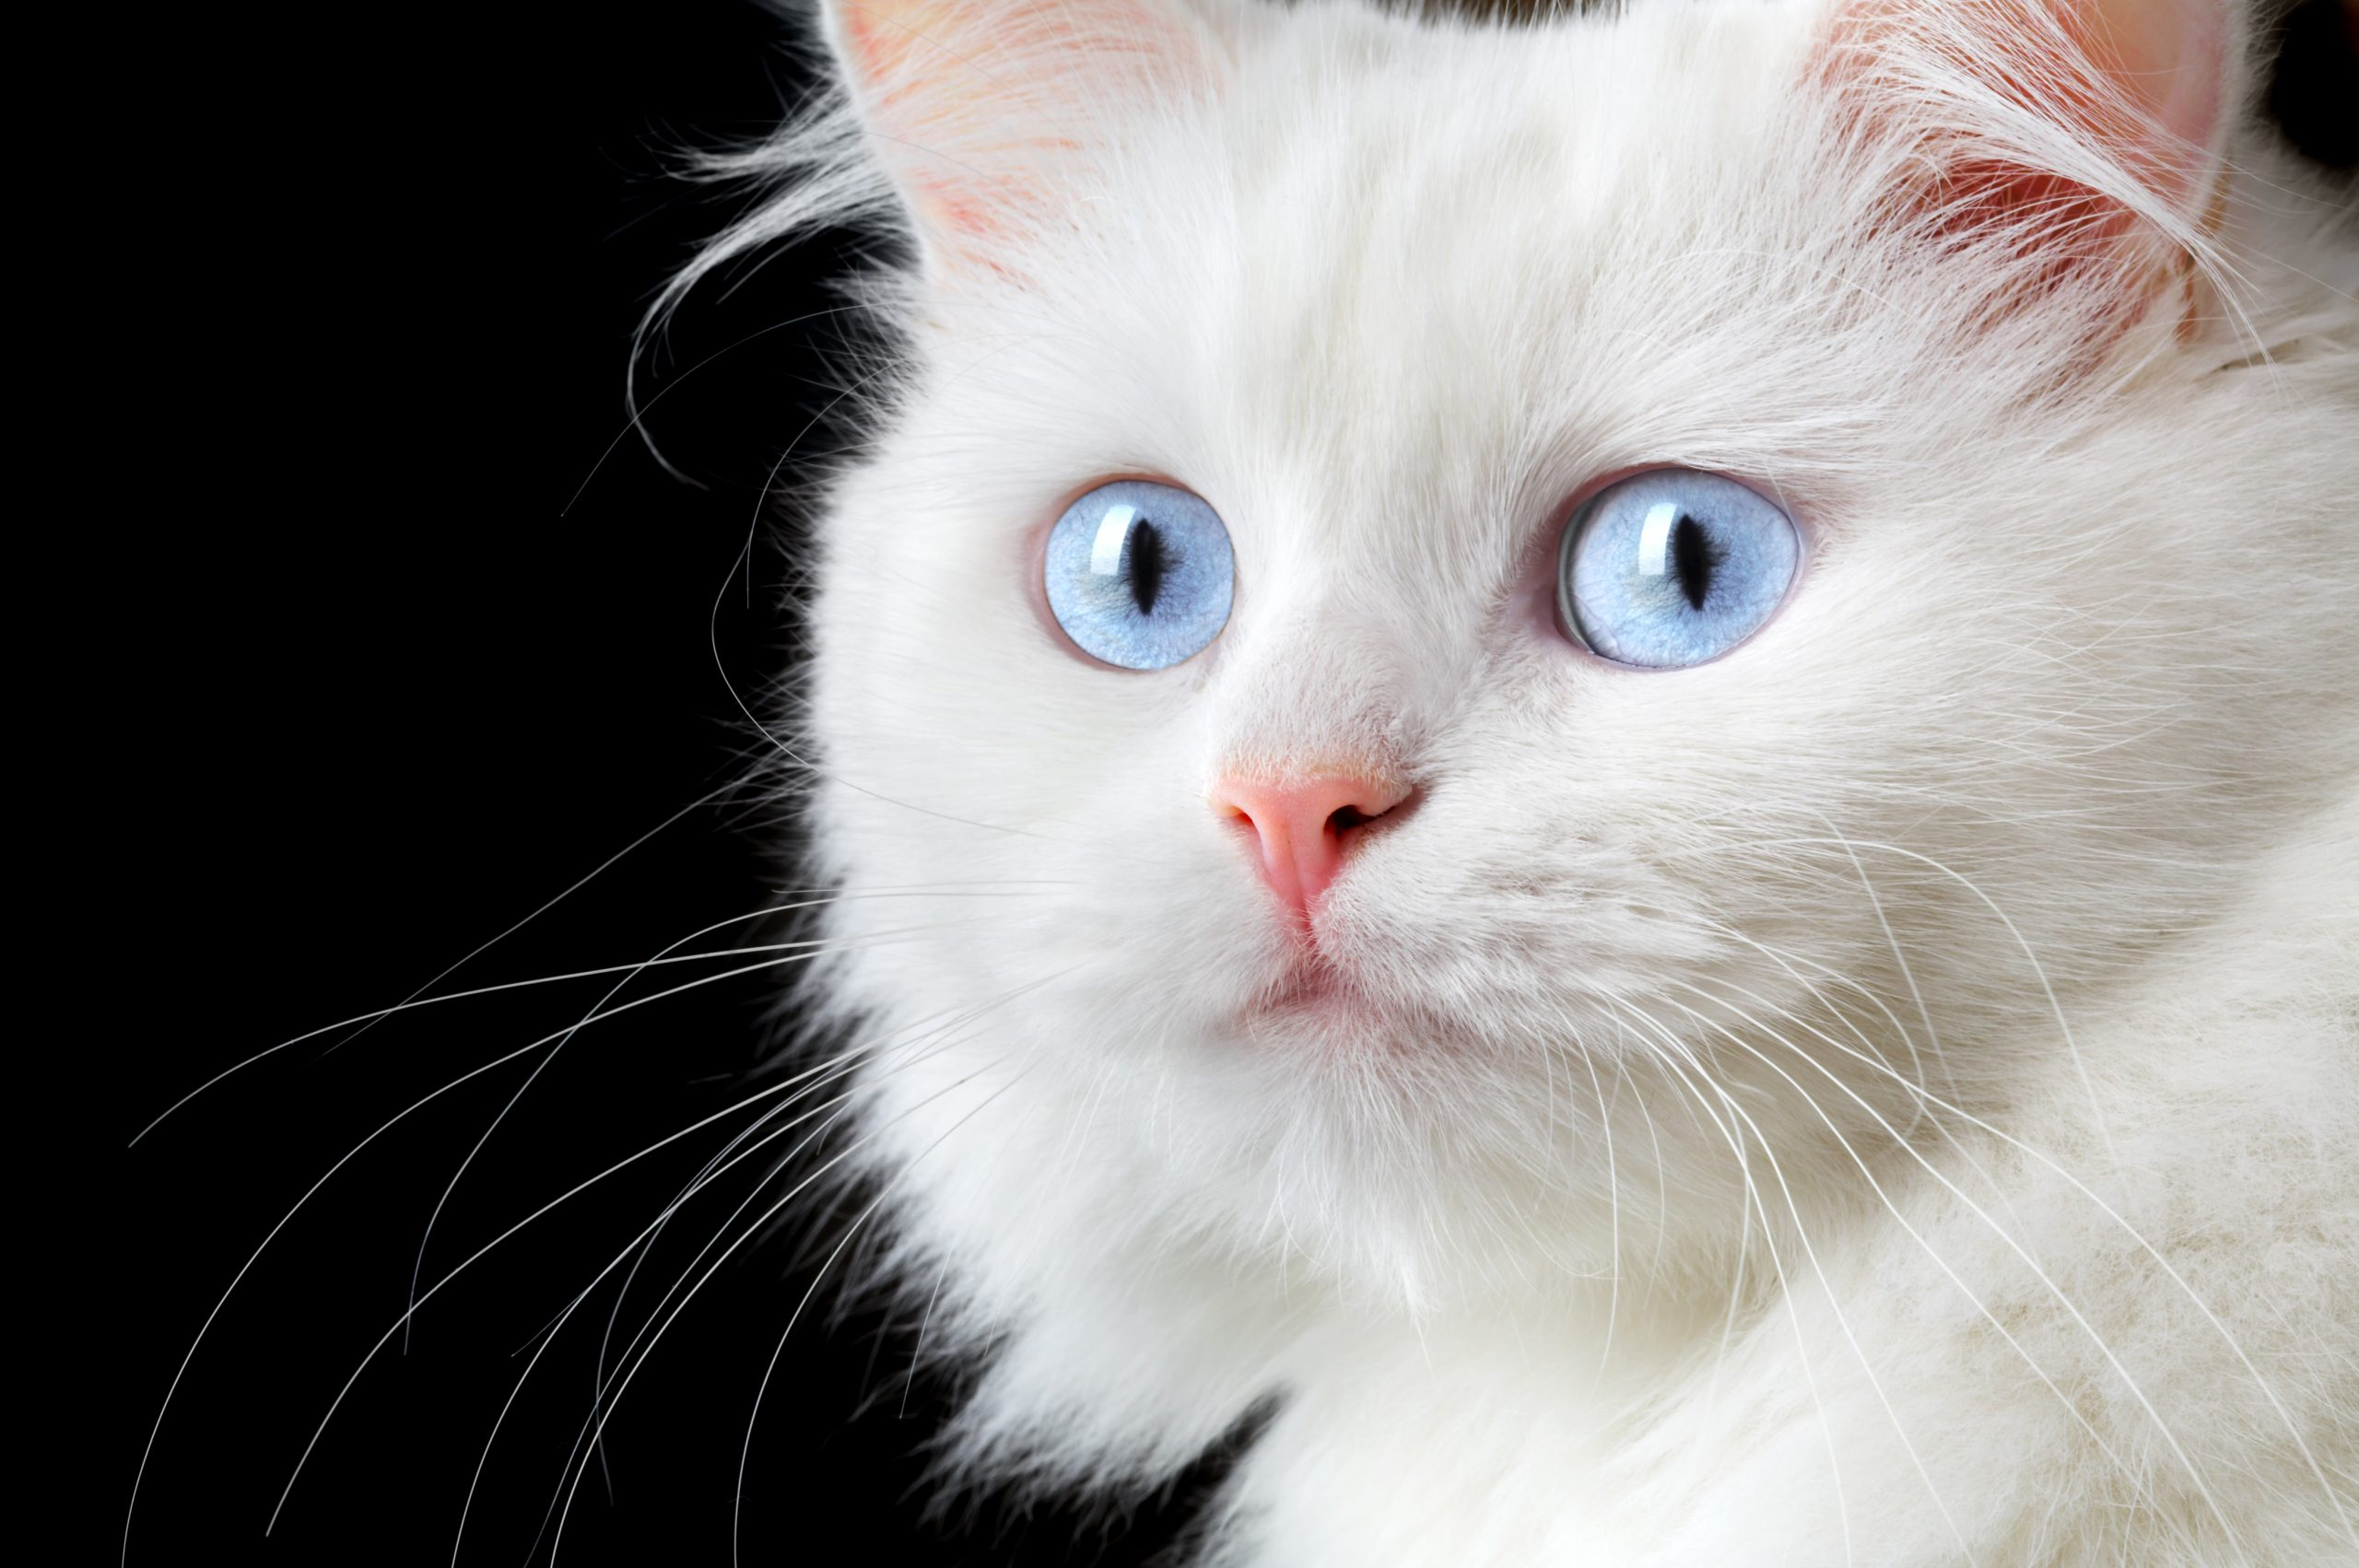 Feline Fears & Anxieties